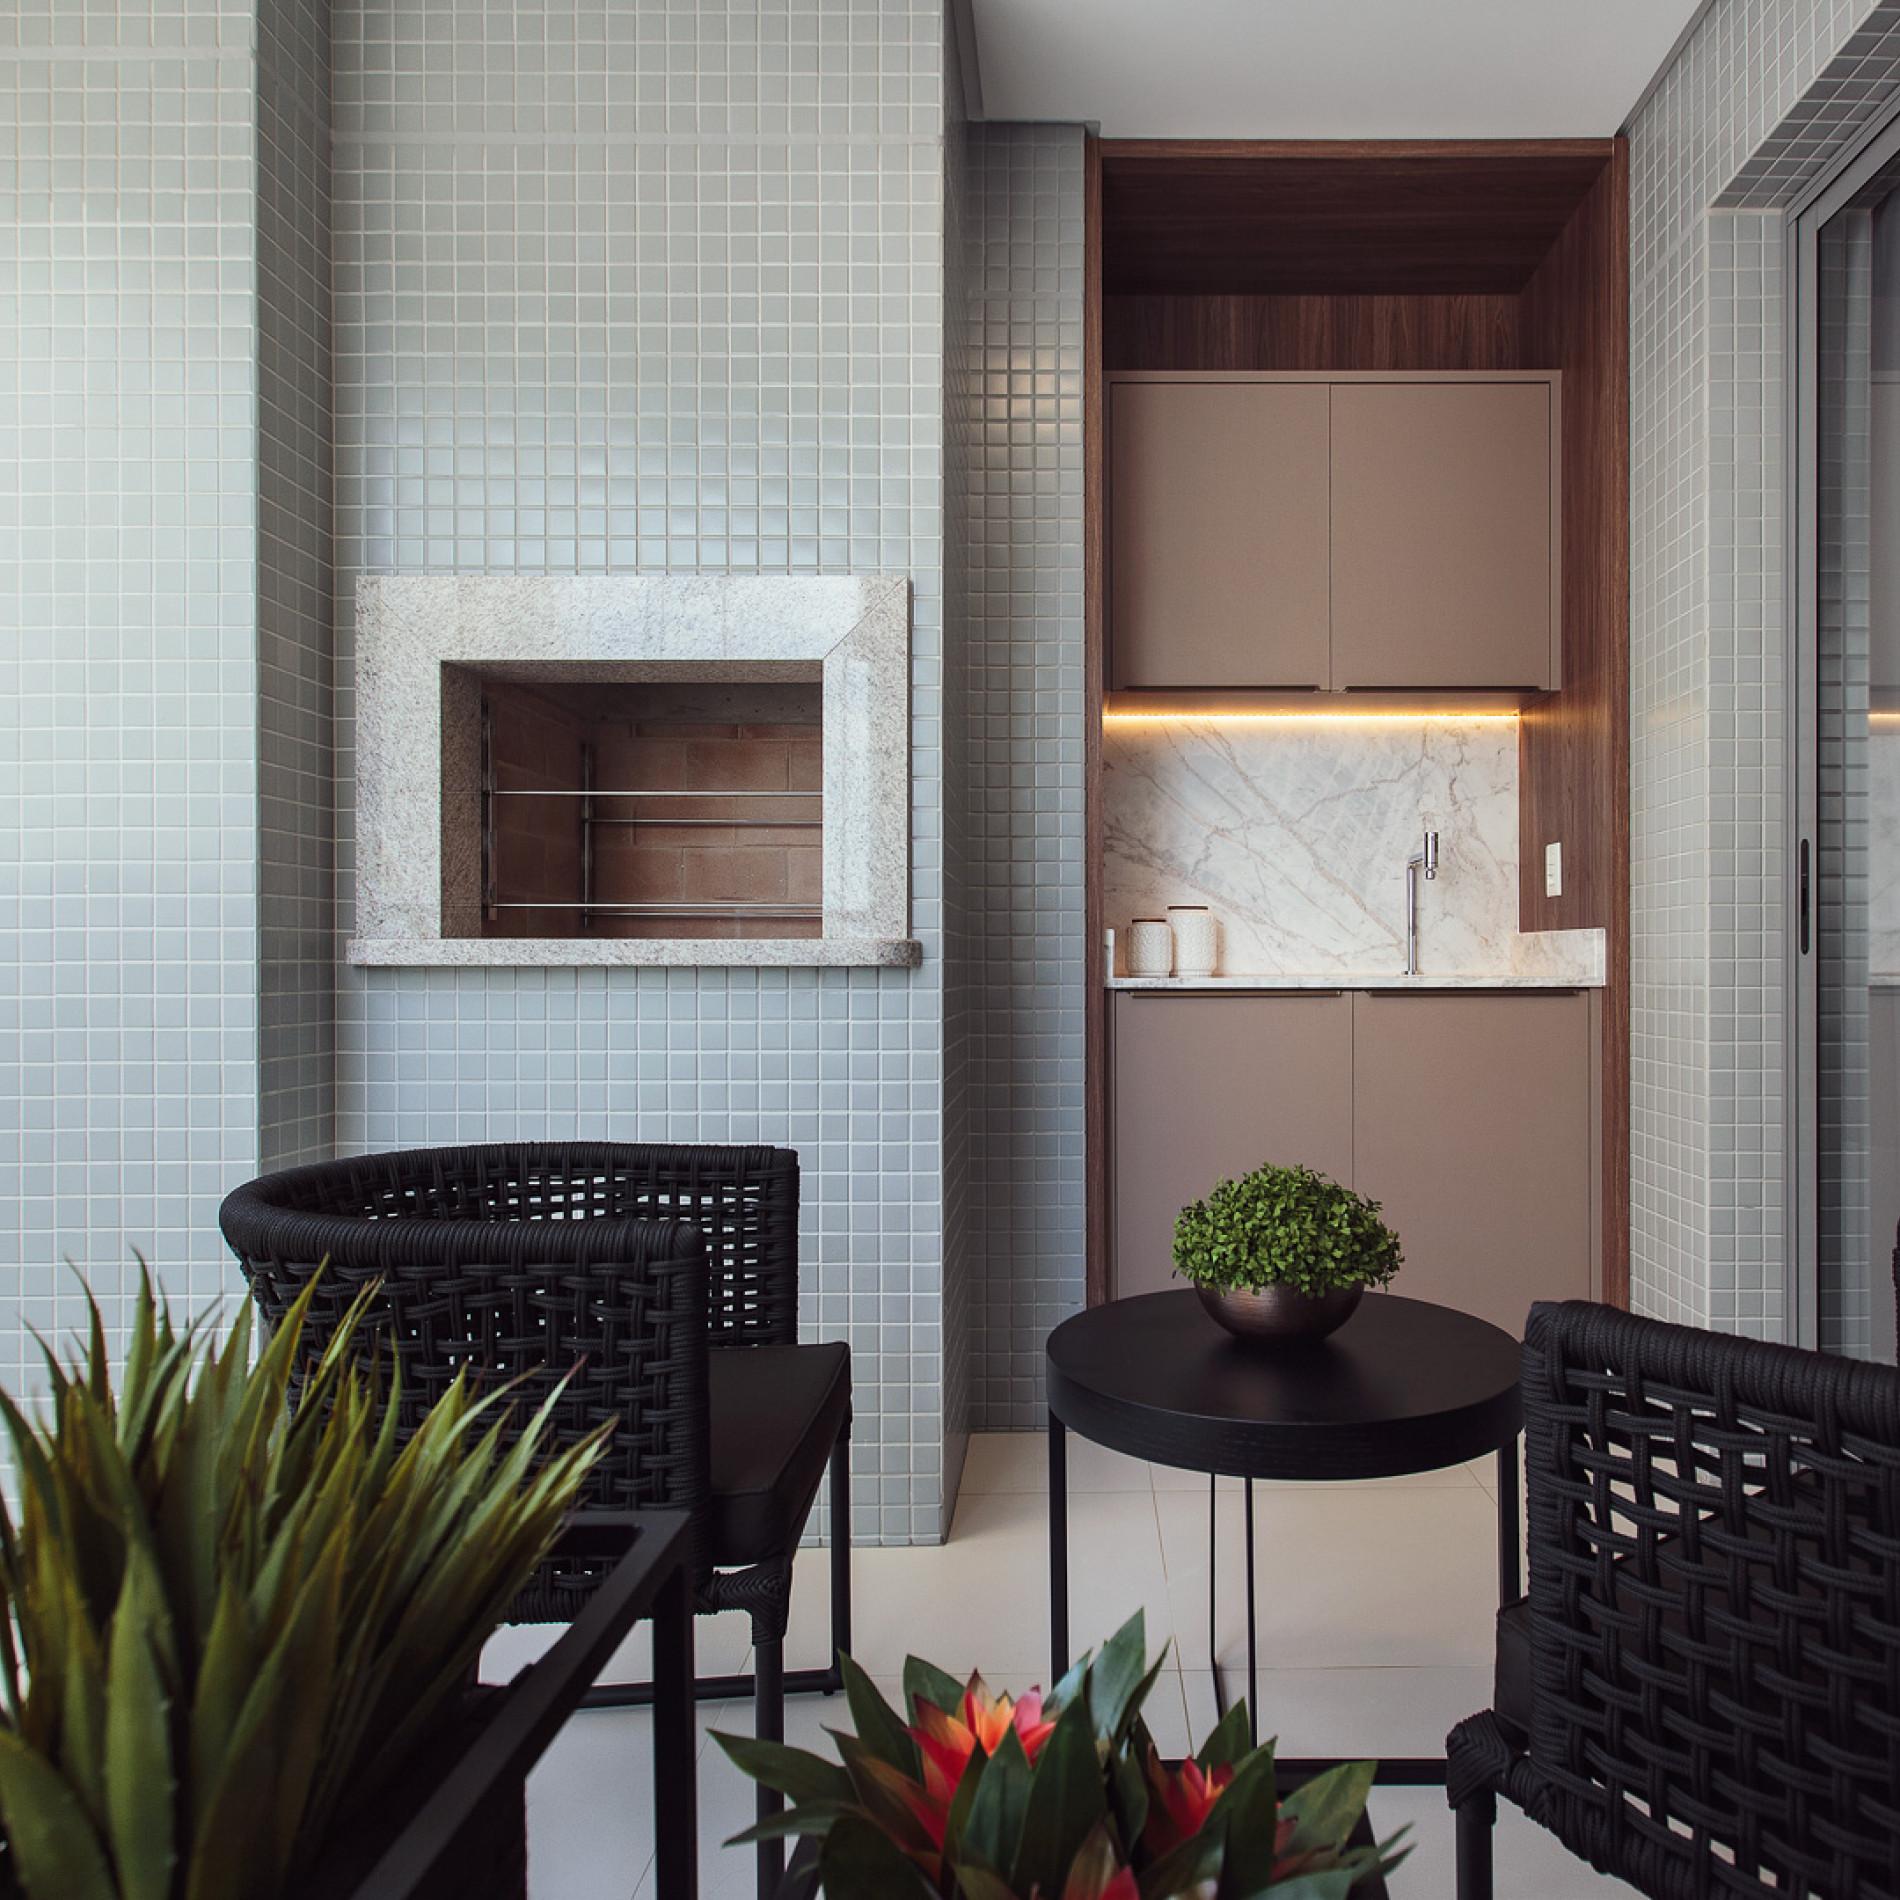 new-york-apartments-sacada-com-churrasqueira-a-carvao.jpg